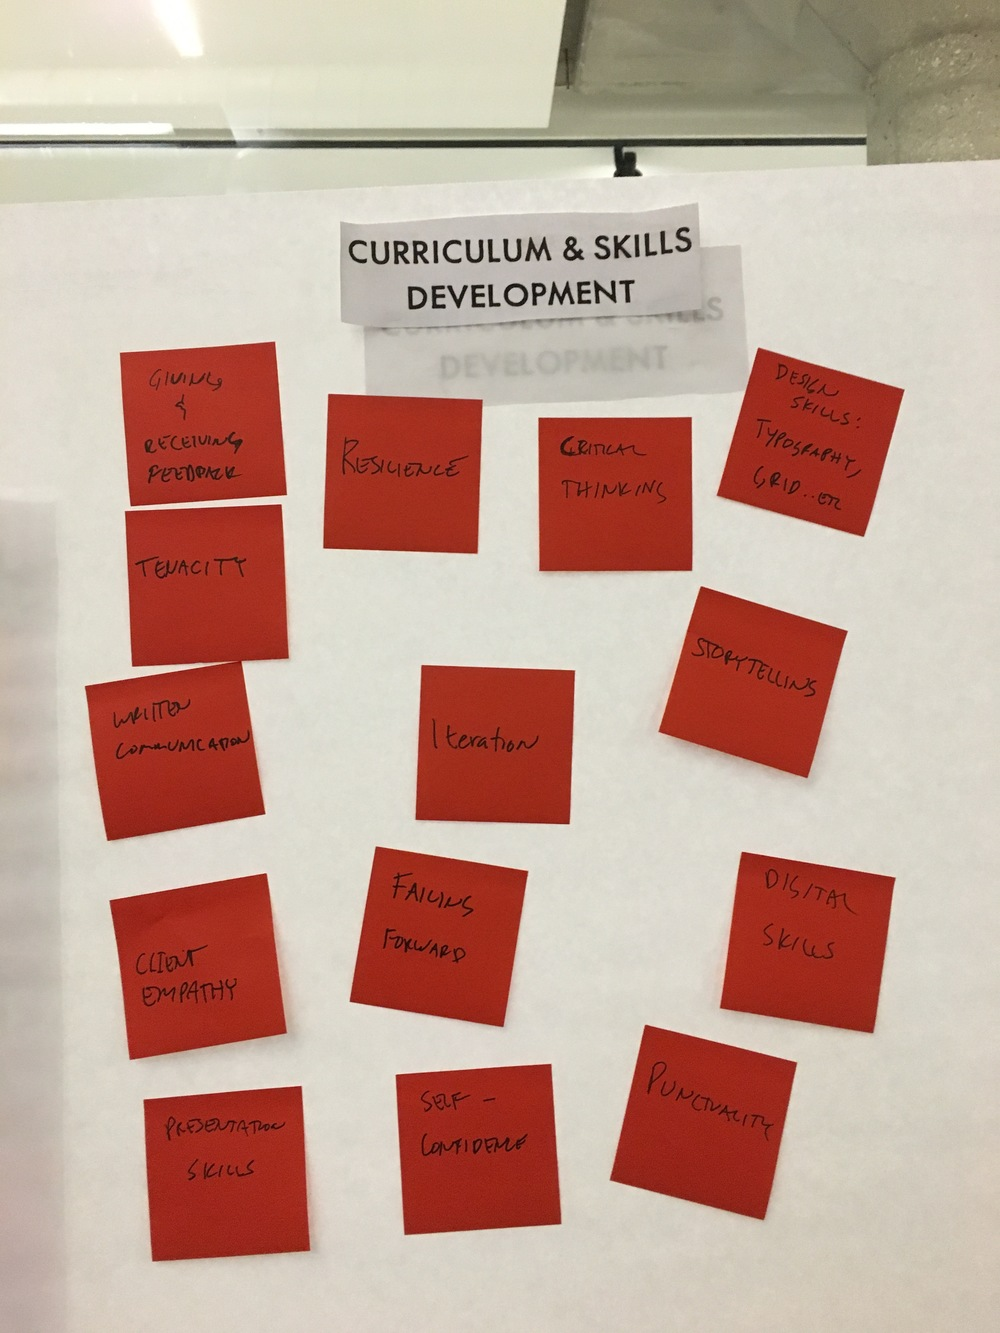 curriculum skills full poster.jpg